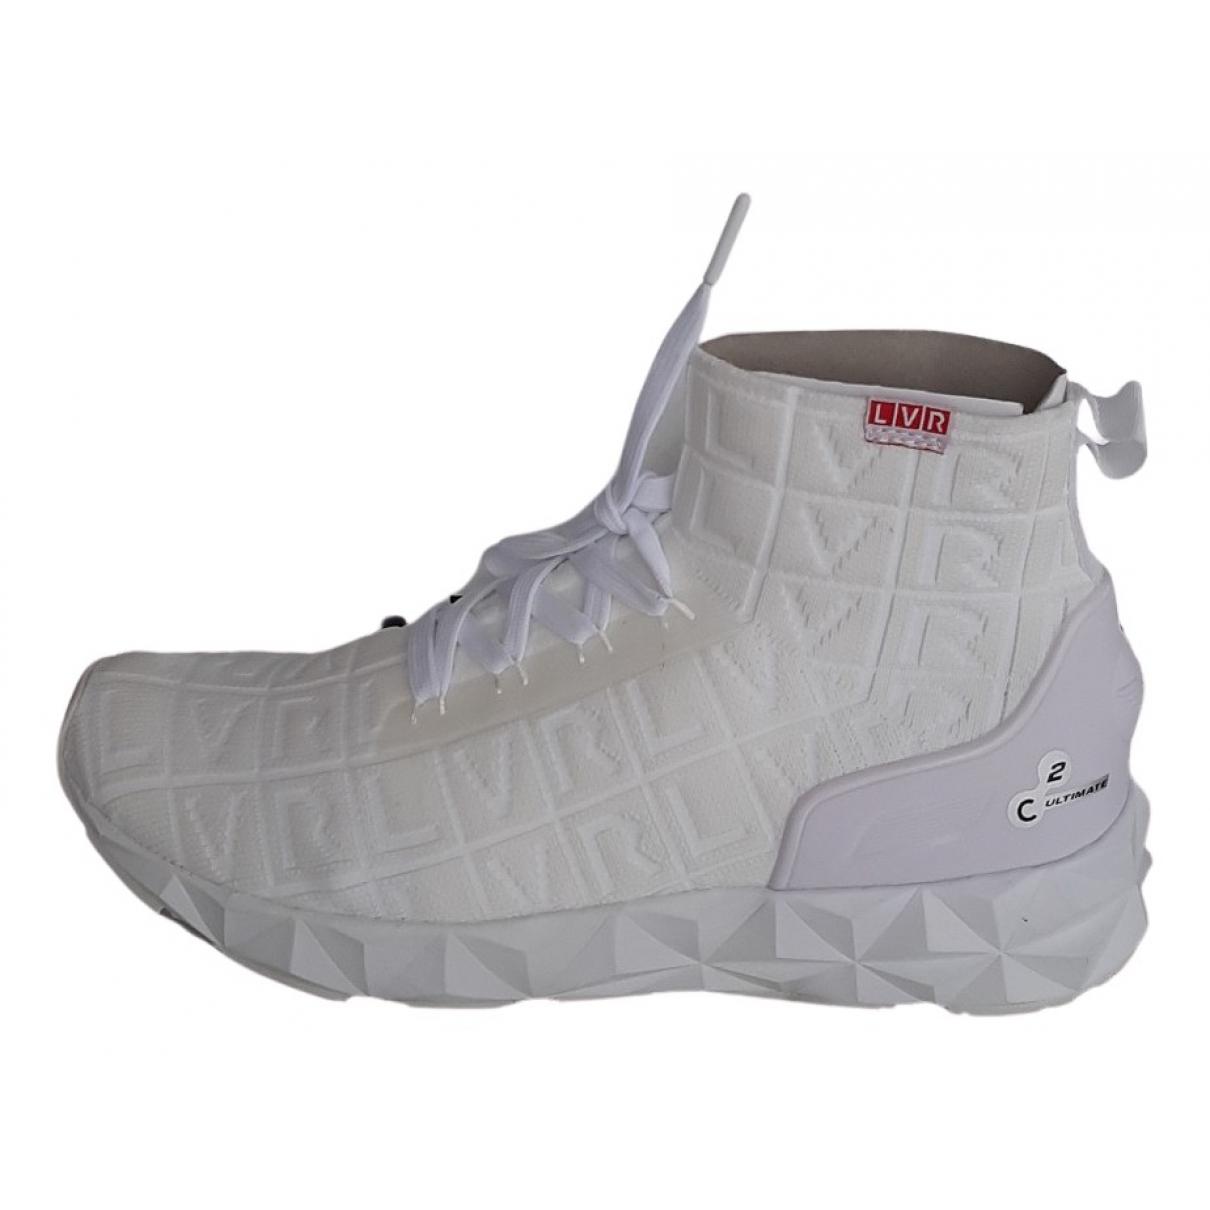 Emporio Armani N White Cloth Trainers for Men 8 UK